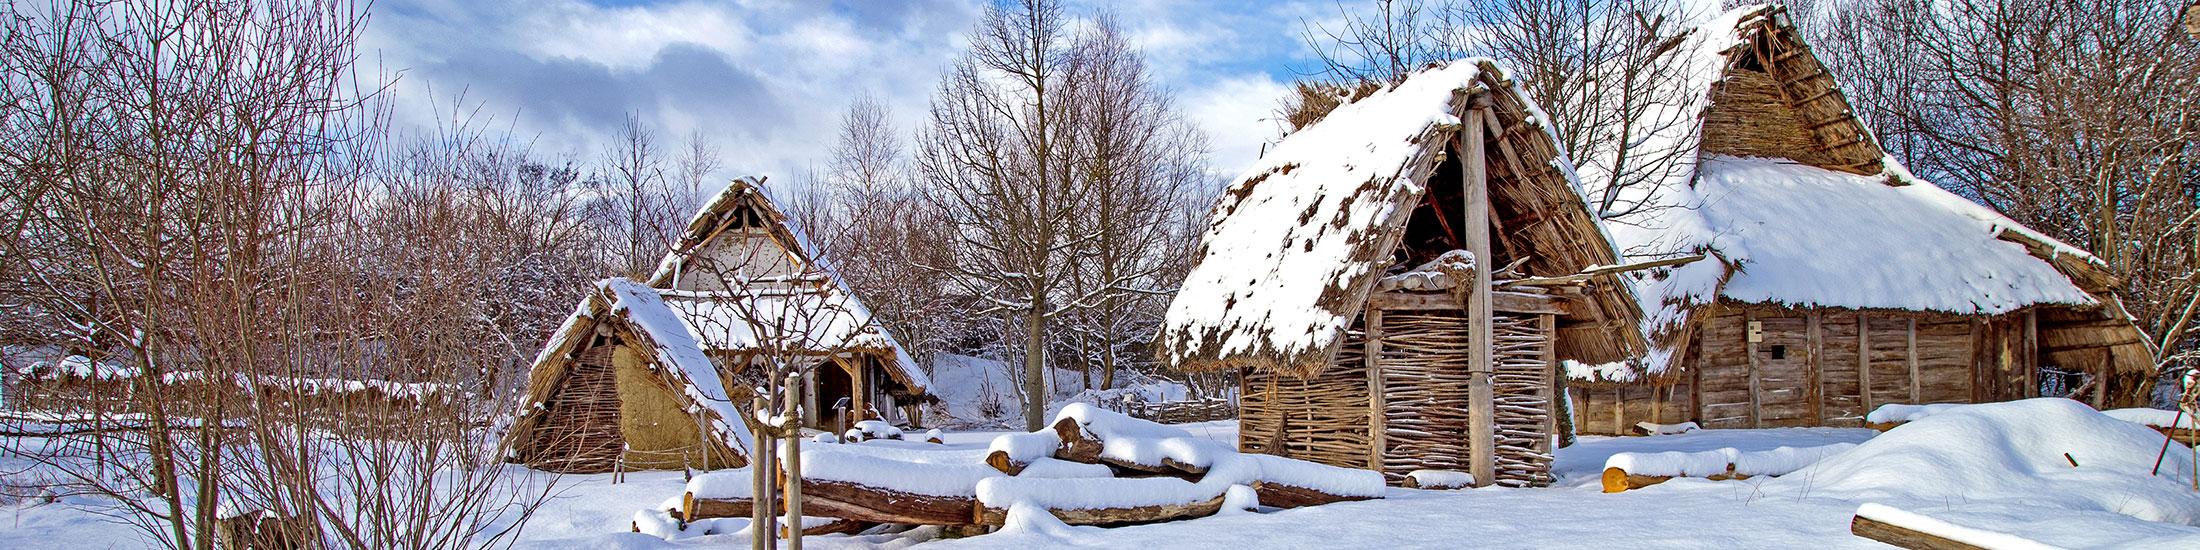 Der Bajuwarenhof Kirchheim im Winter